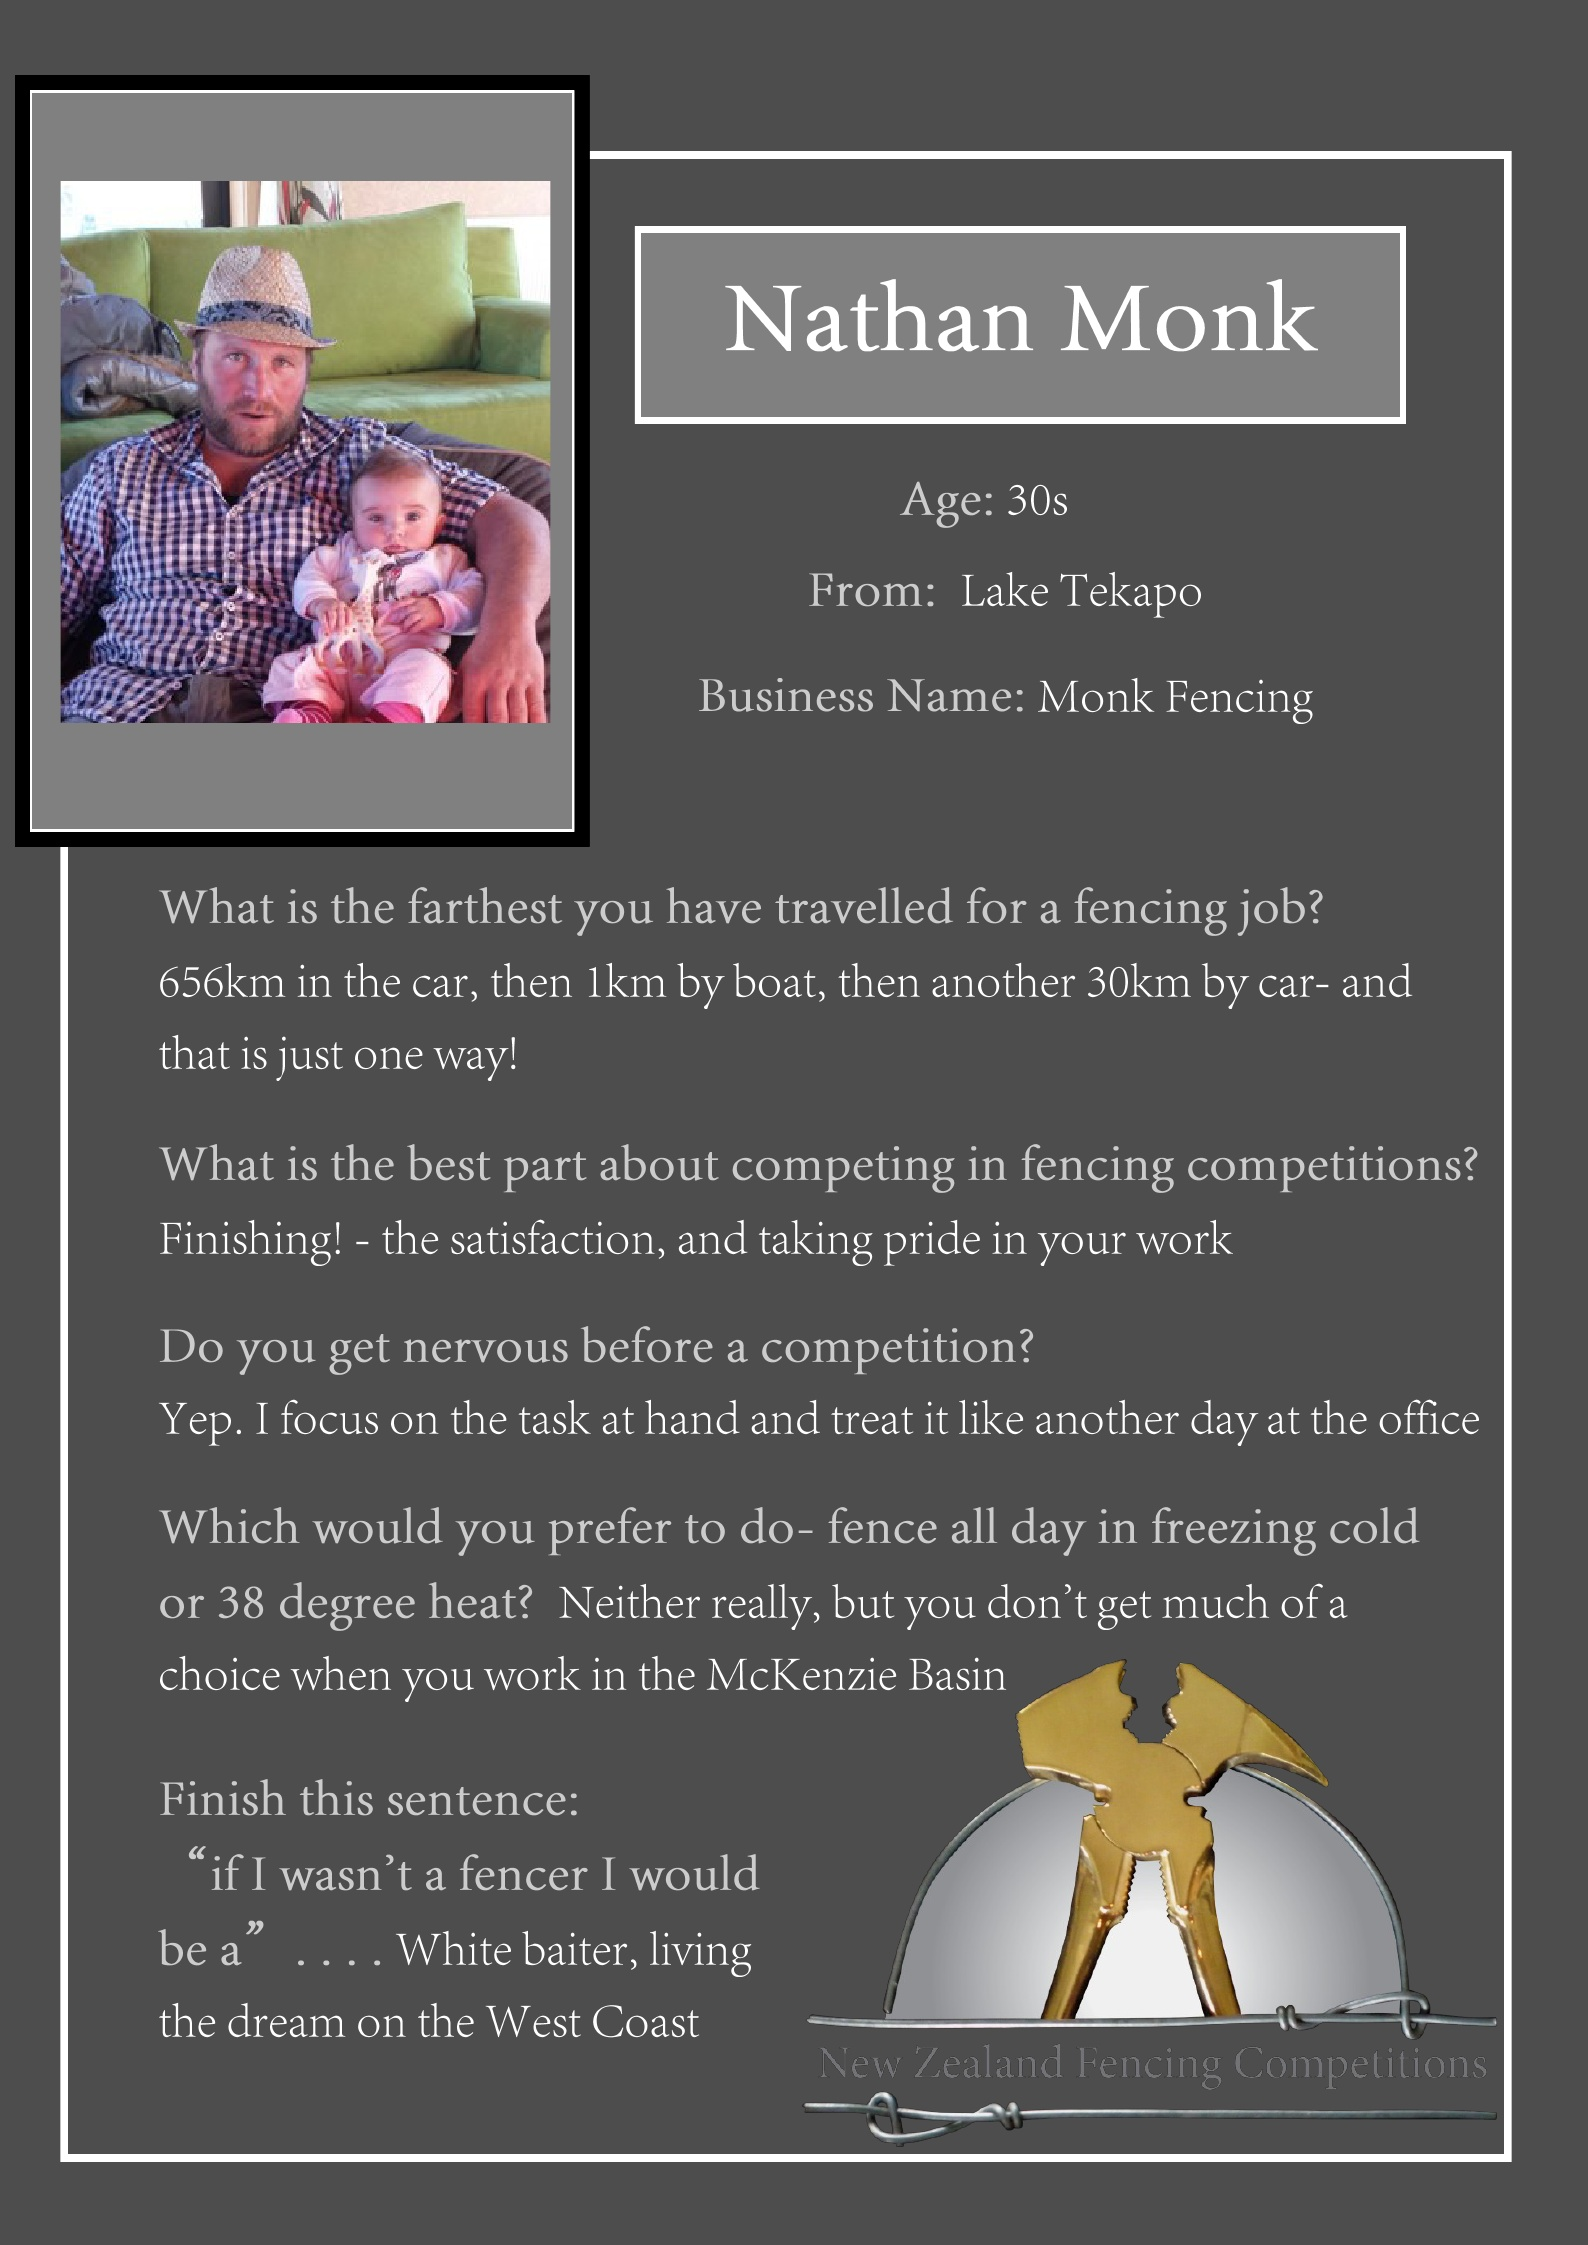 Nathan Monk